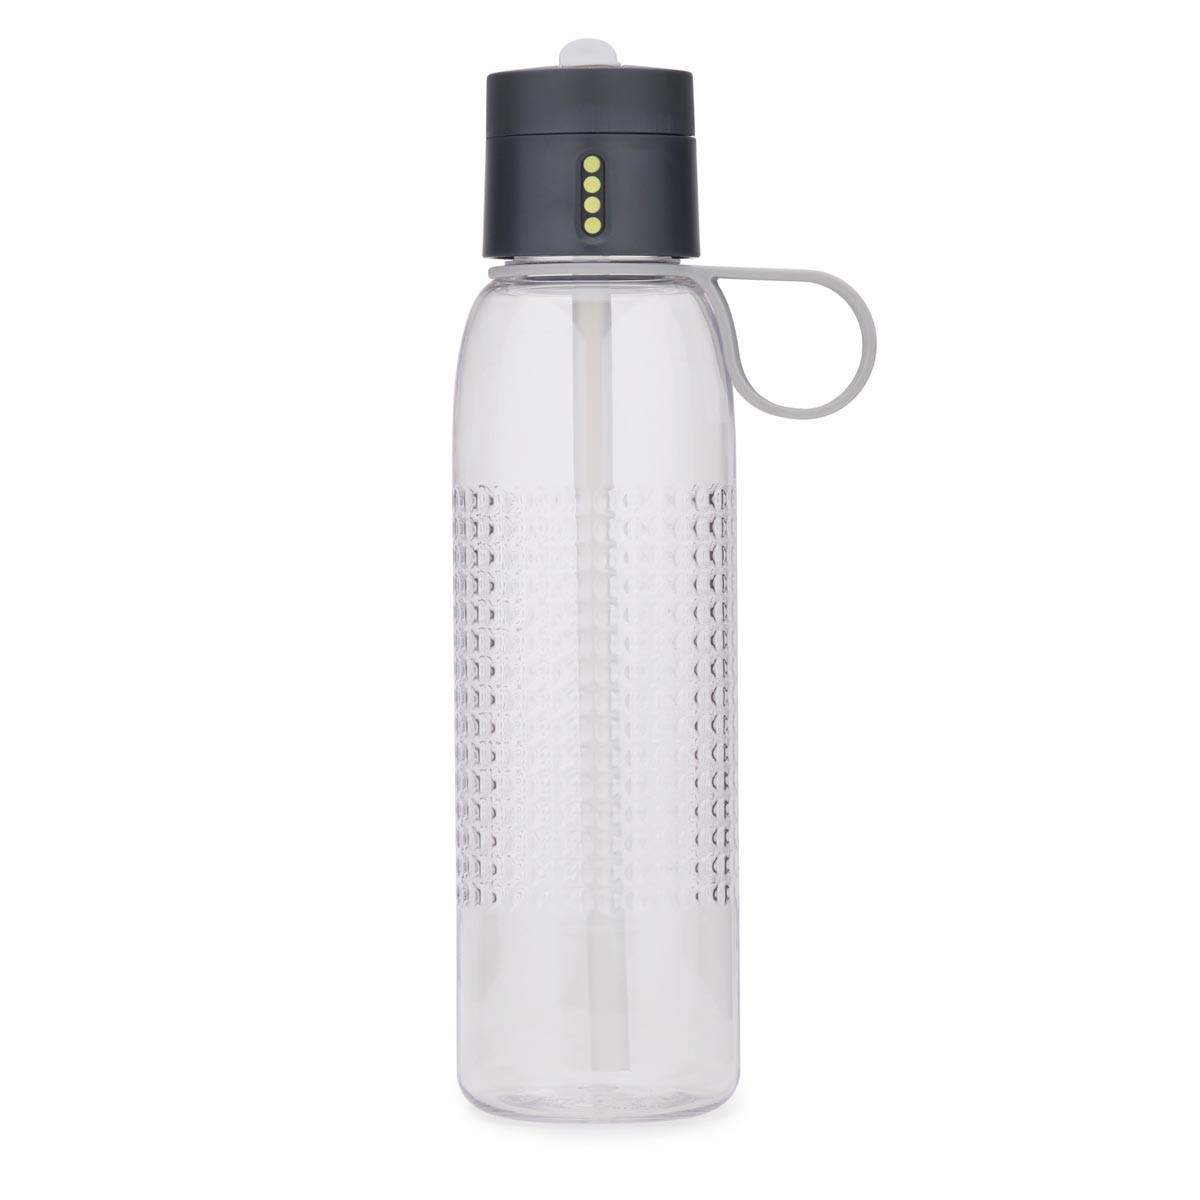 Butelka na wodę 0,75l Joseph Joseph Dot Active szara